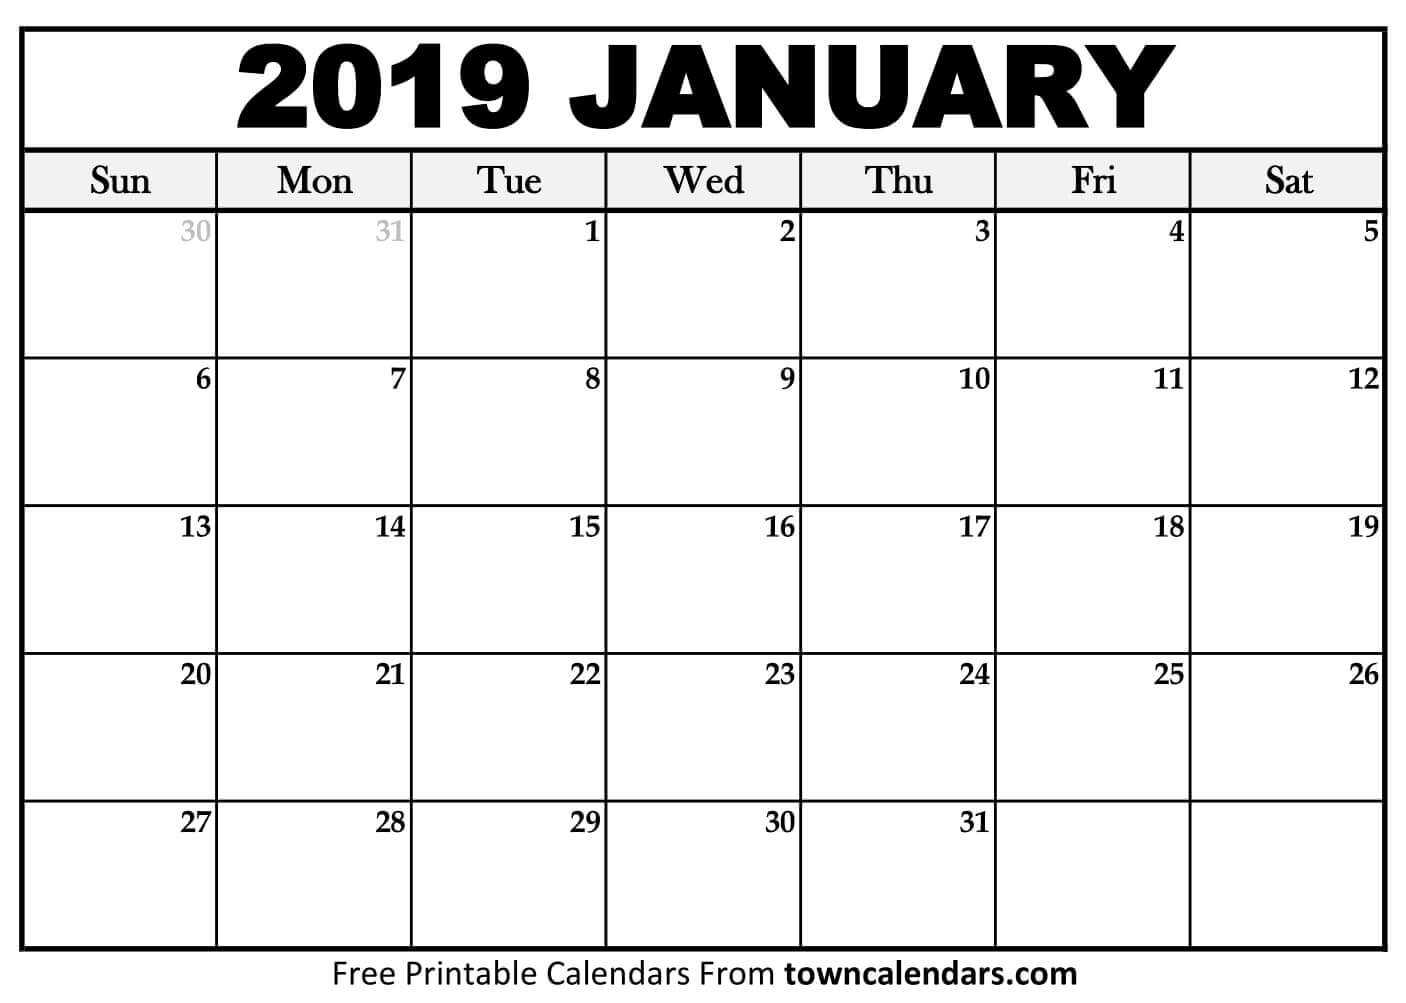 Printable January 2019 Calendar - Towncalendars Calendar 2019 January